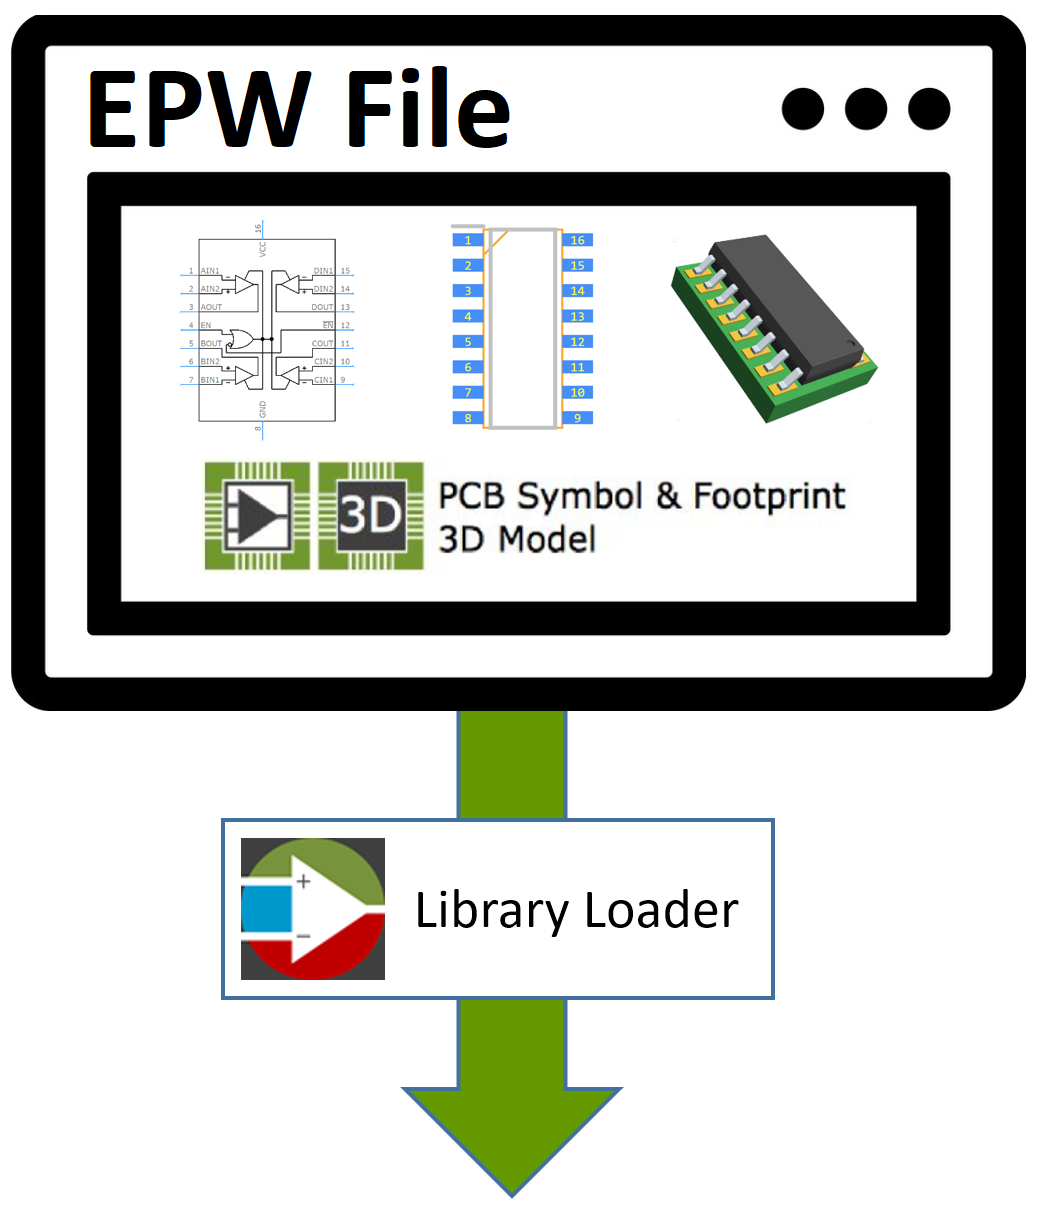 EPW File